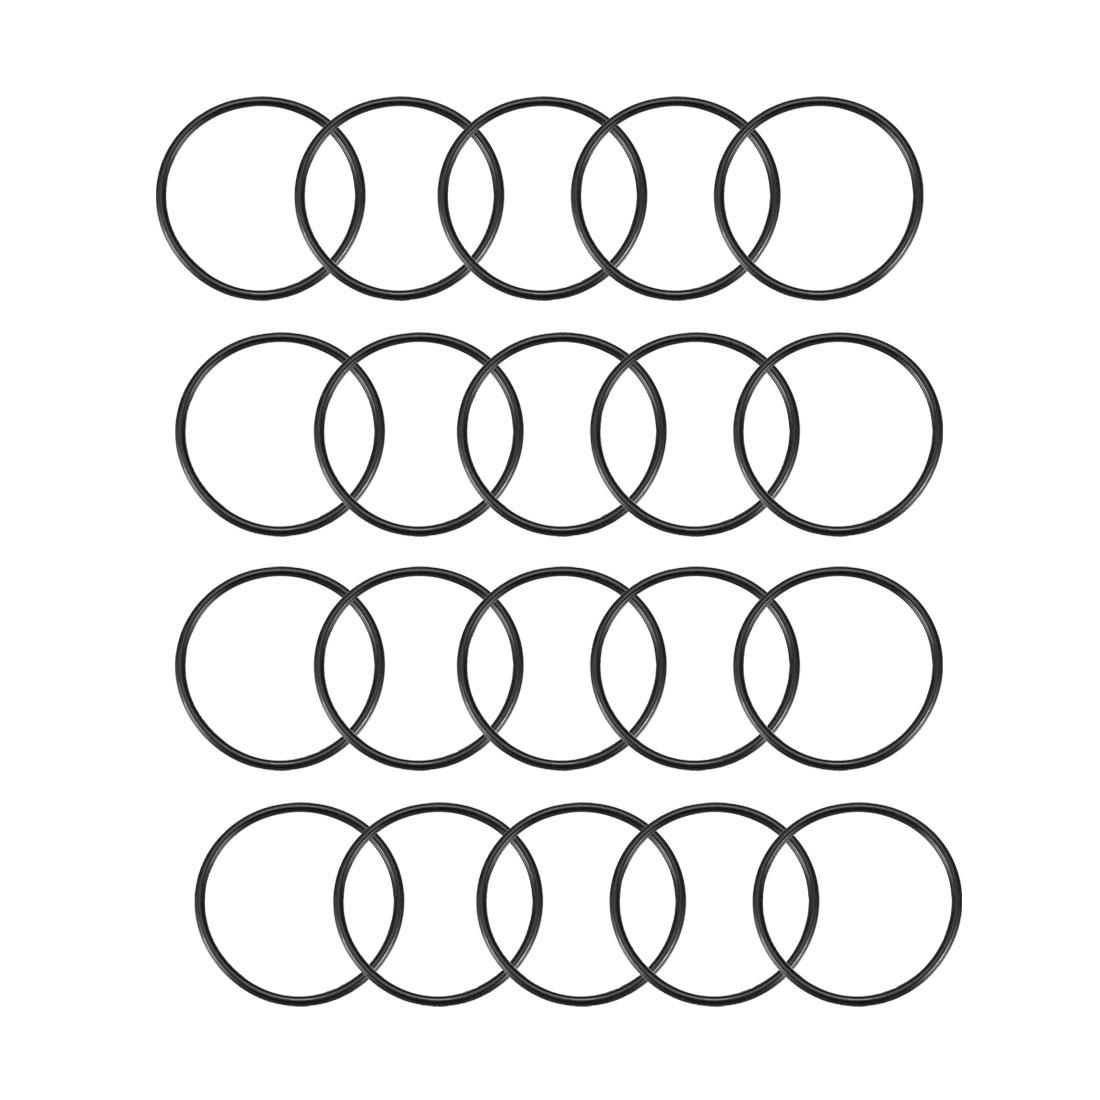 20 Pcs Black 30mm x 1.5mm Nitrile Rubber O Ring NBR Oil Sealing Grommets